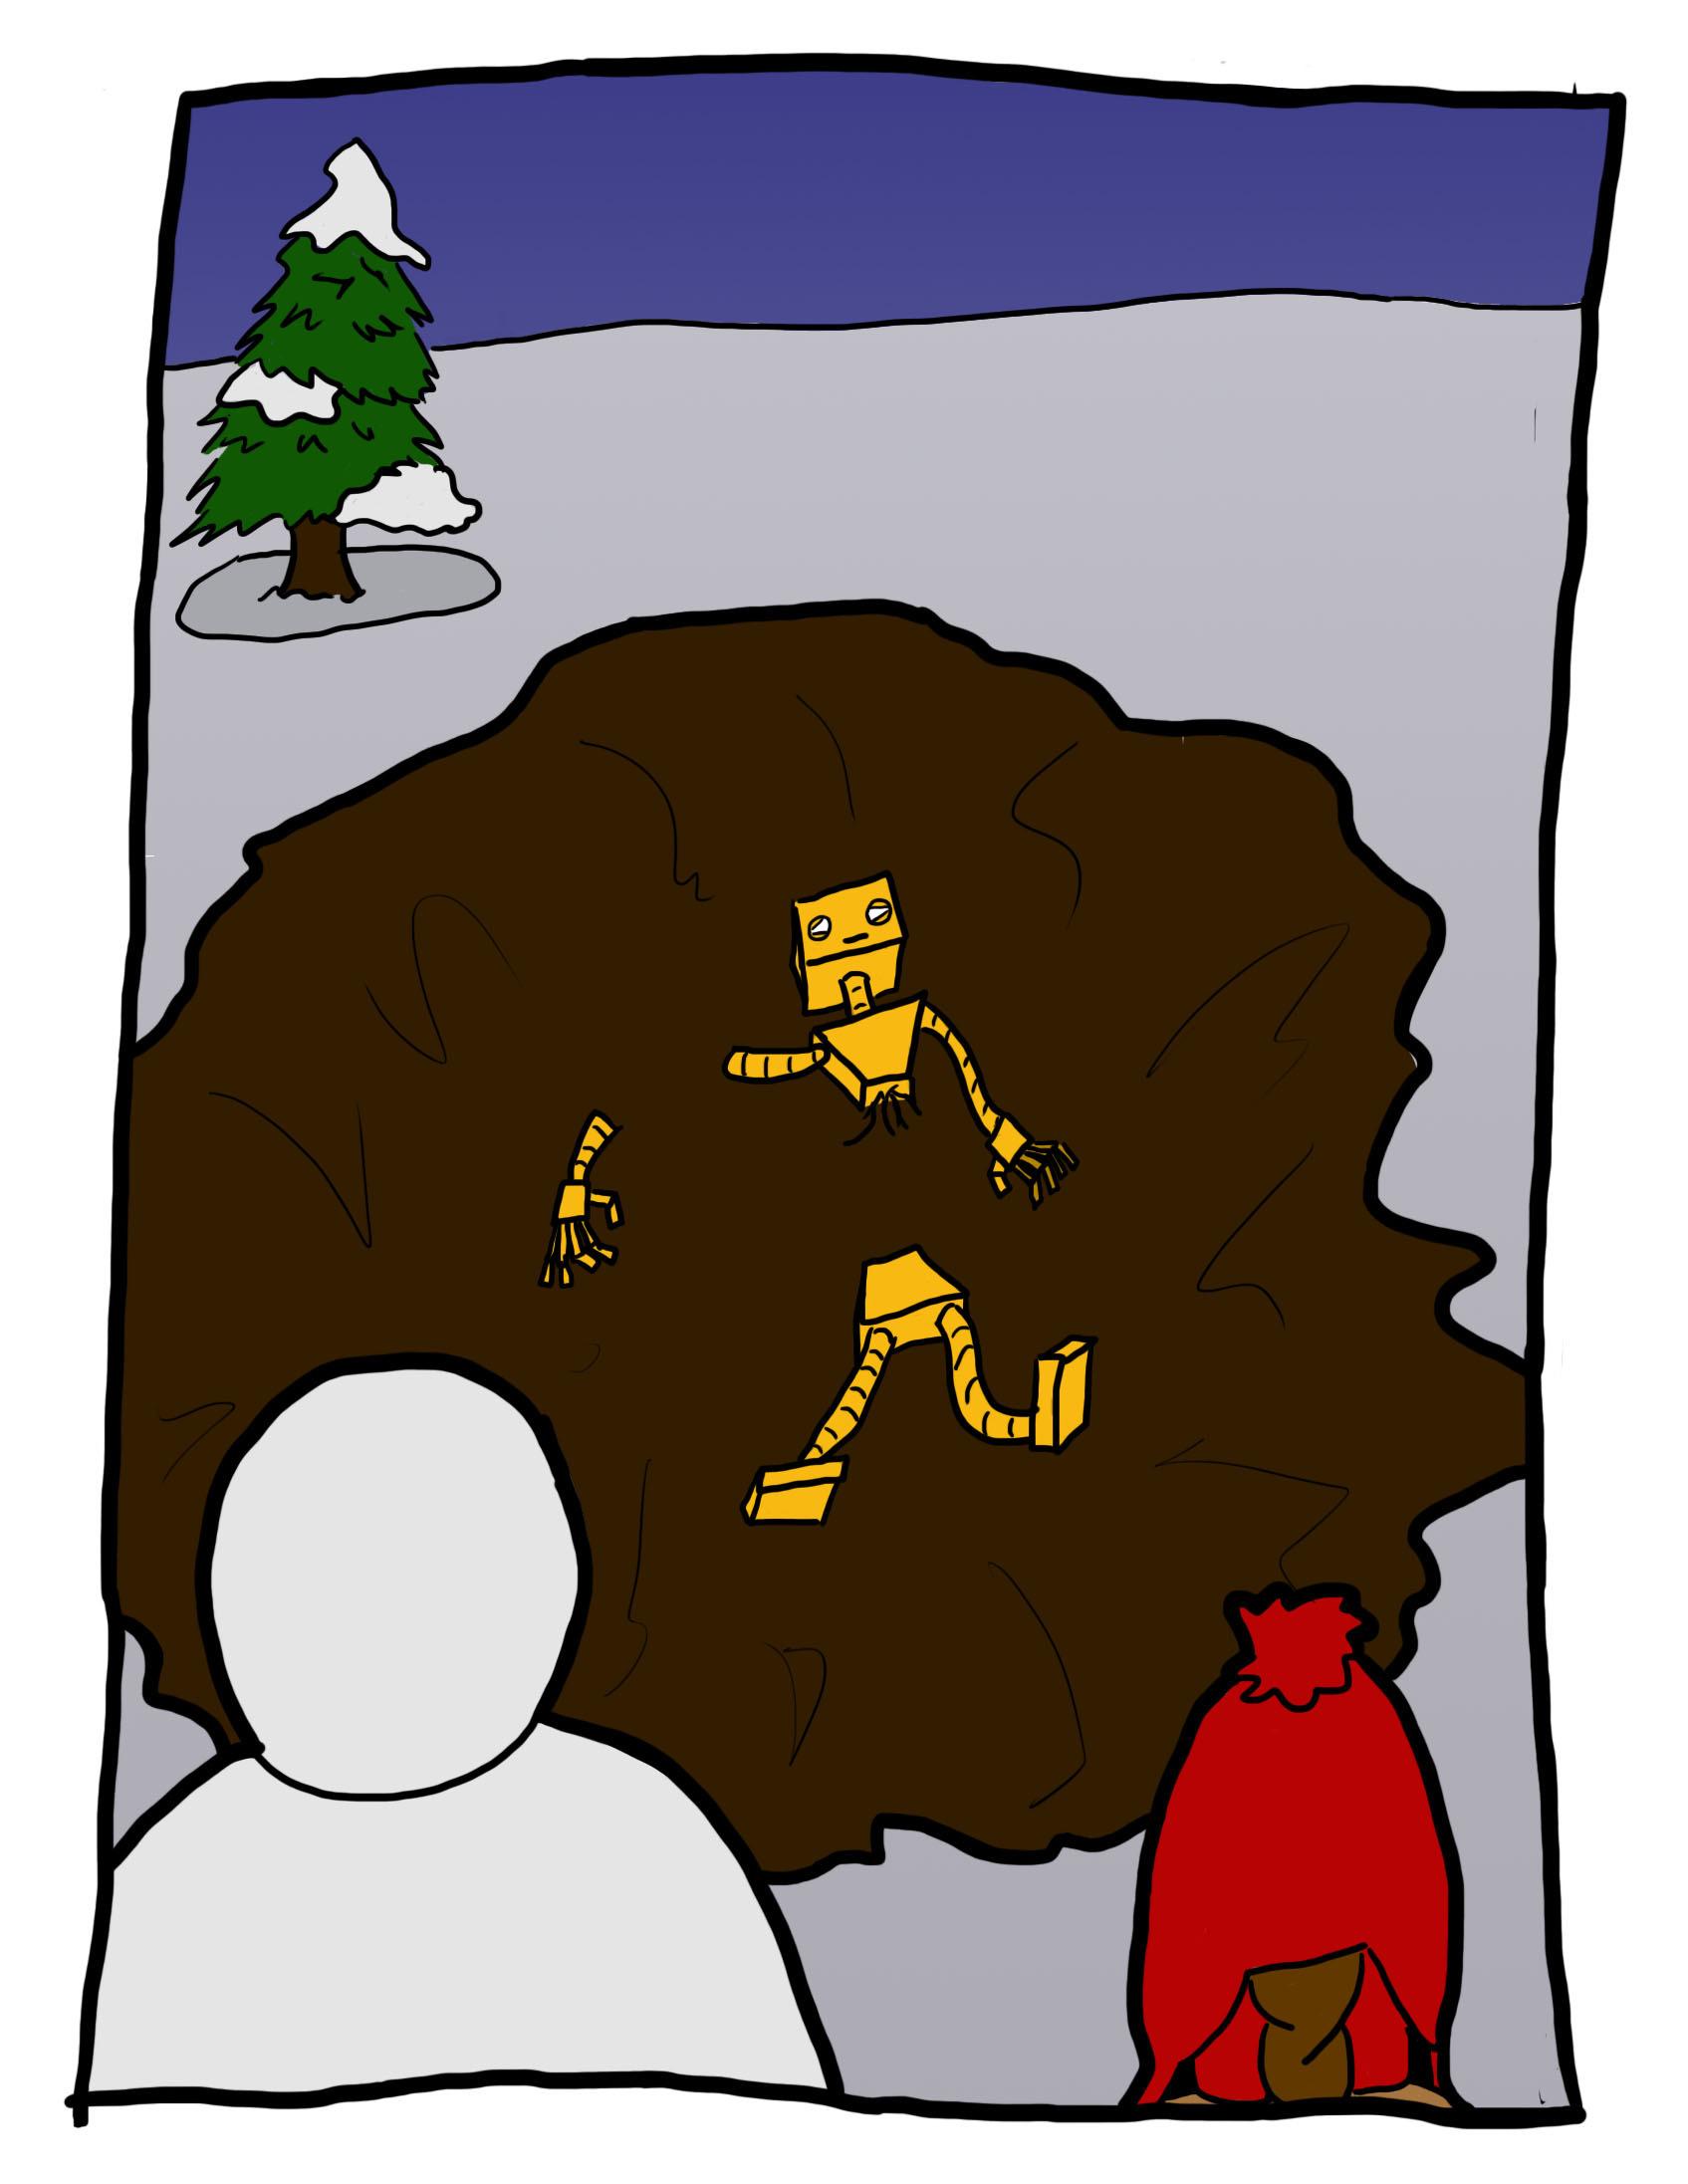 Every Snowman Dies 6